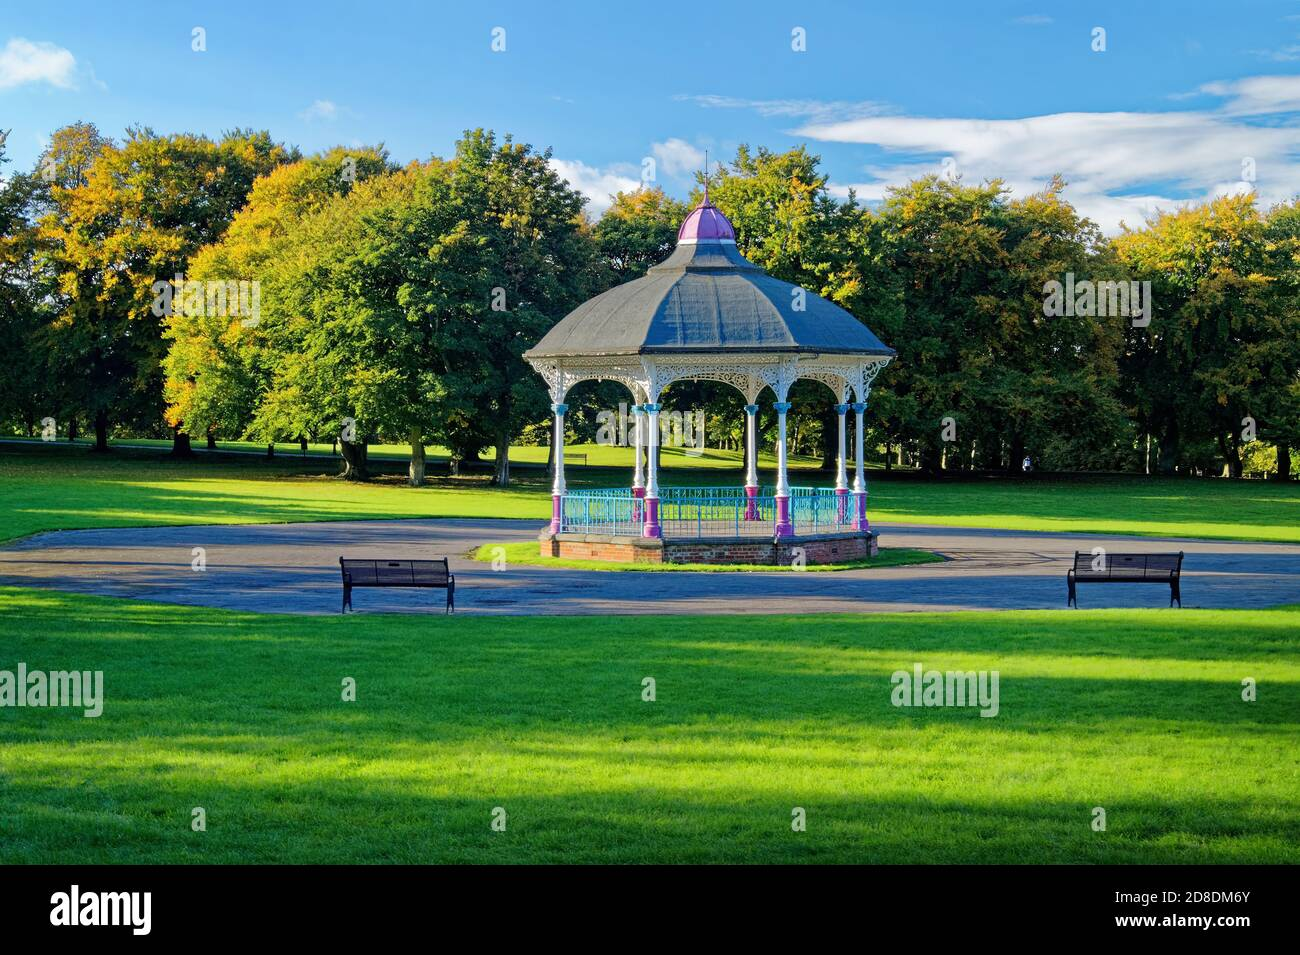 Regno Unito, South Yorkshire, Barnsley, Locke Park Bandstand Foto Stock